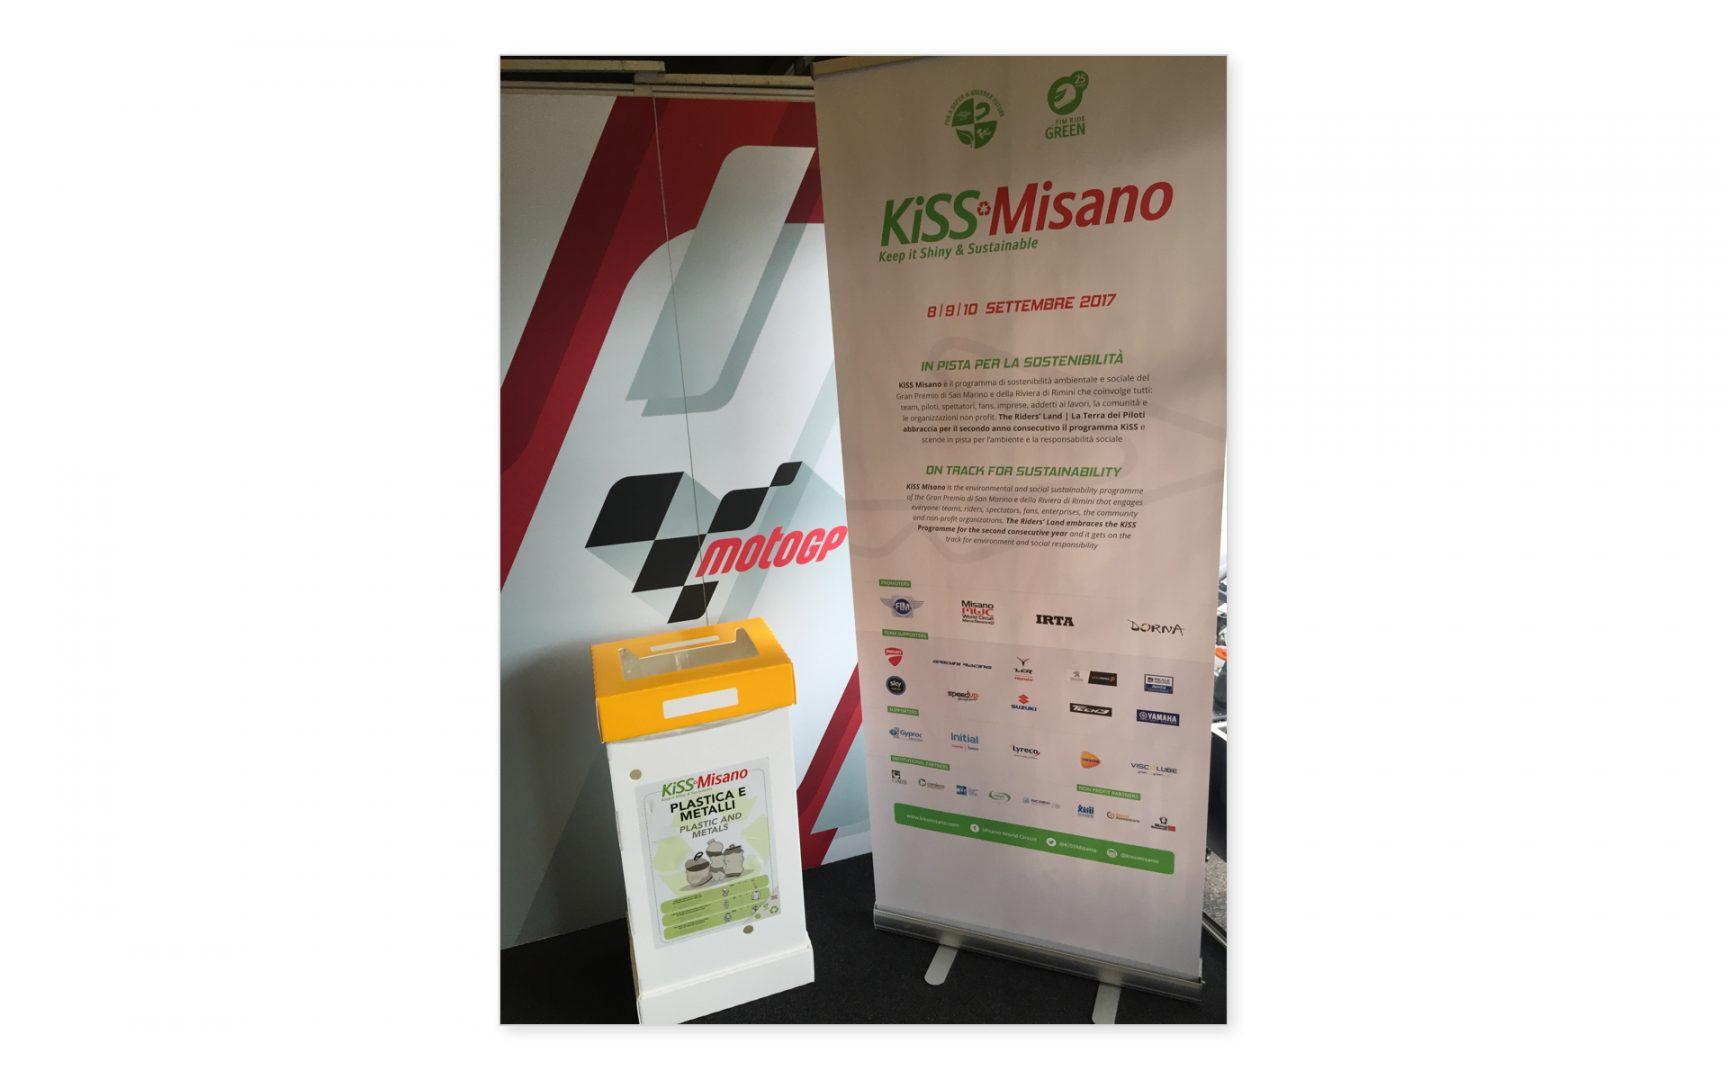 misano-002